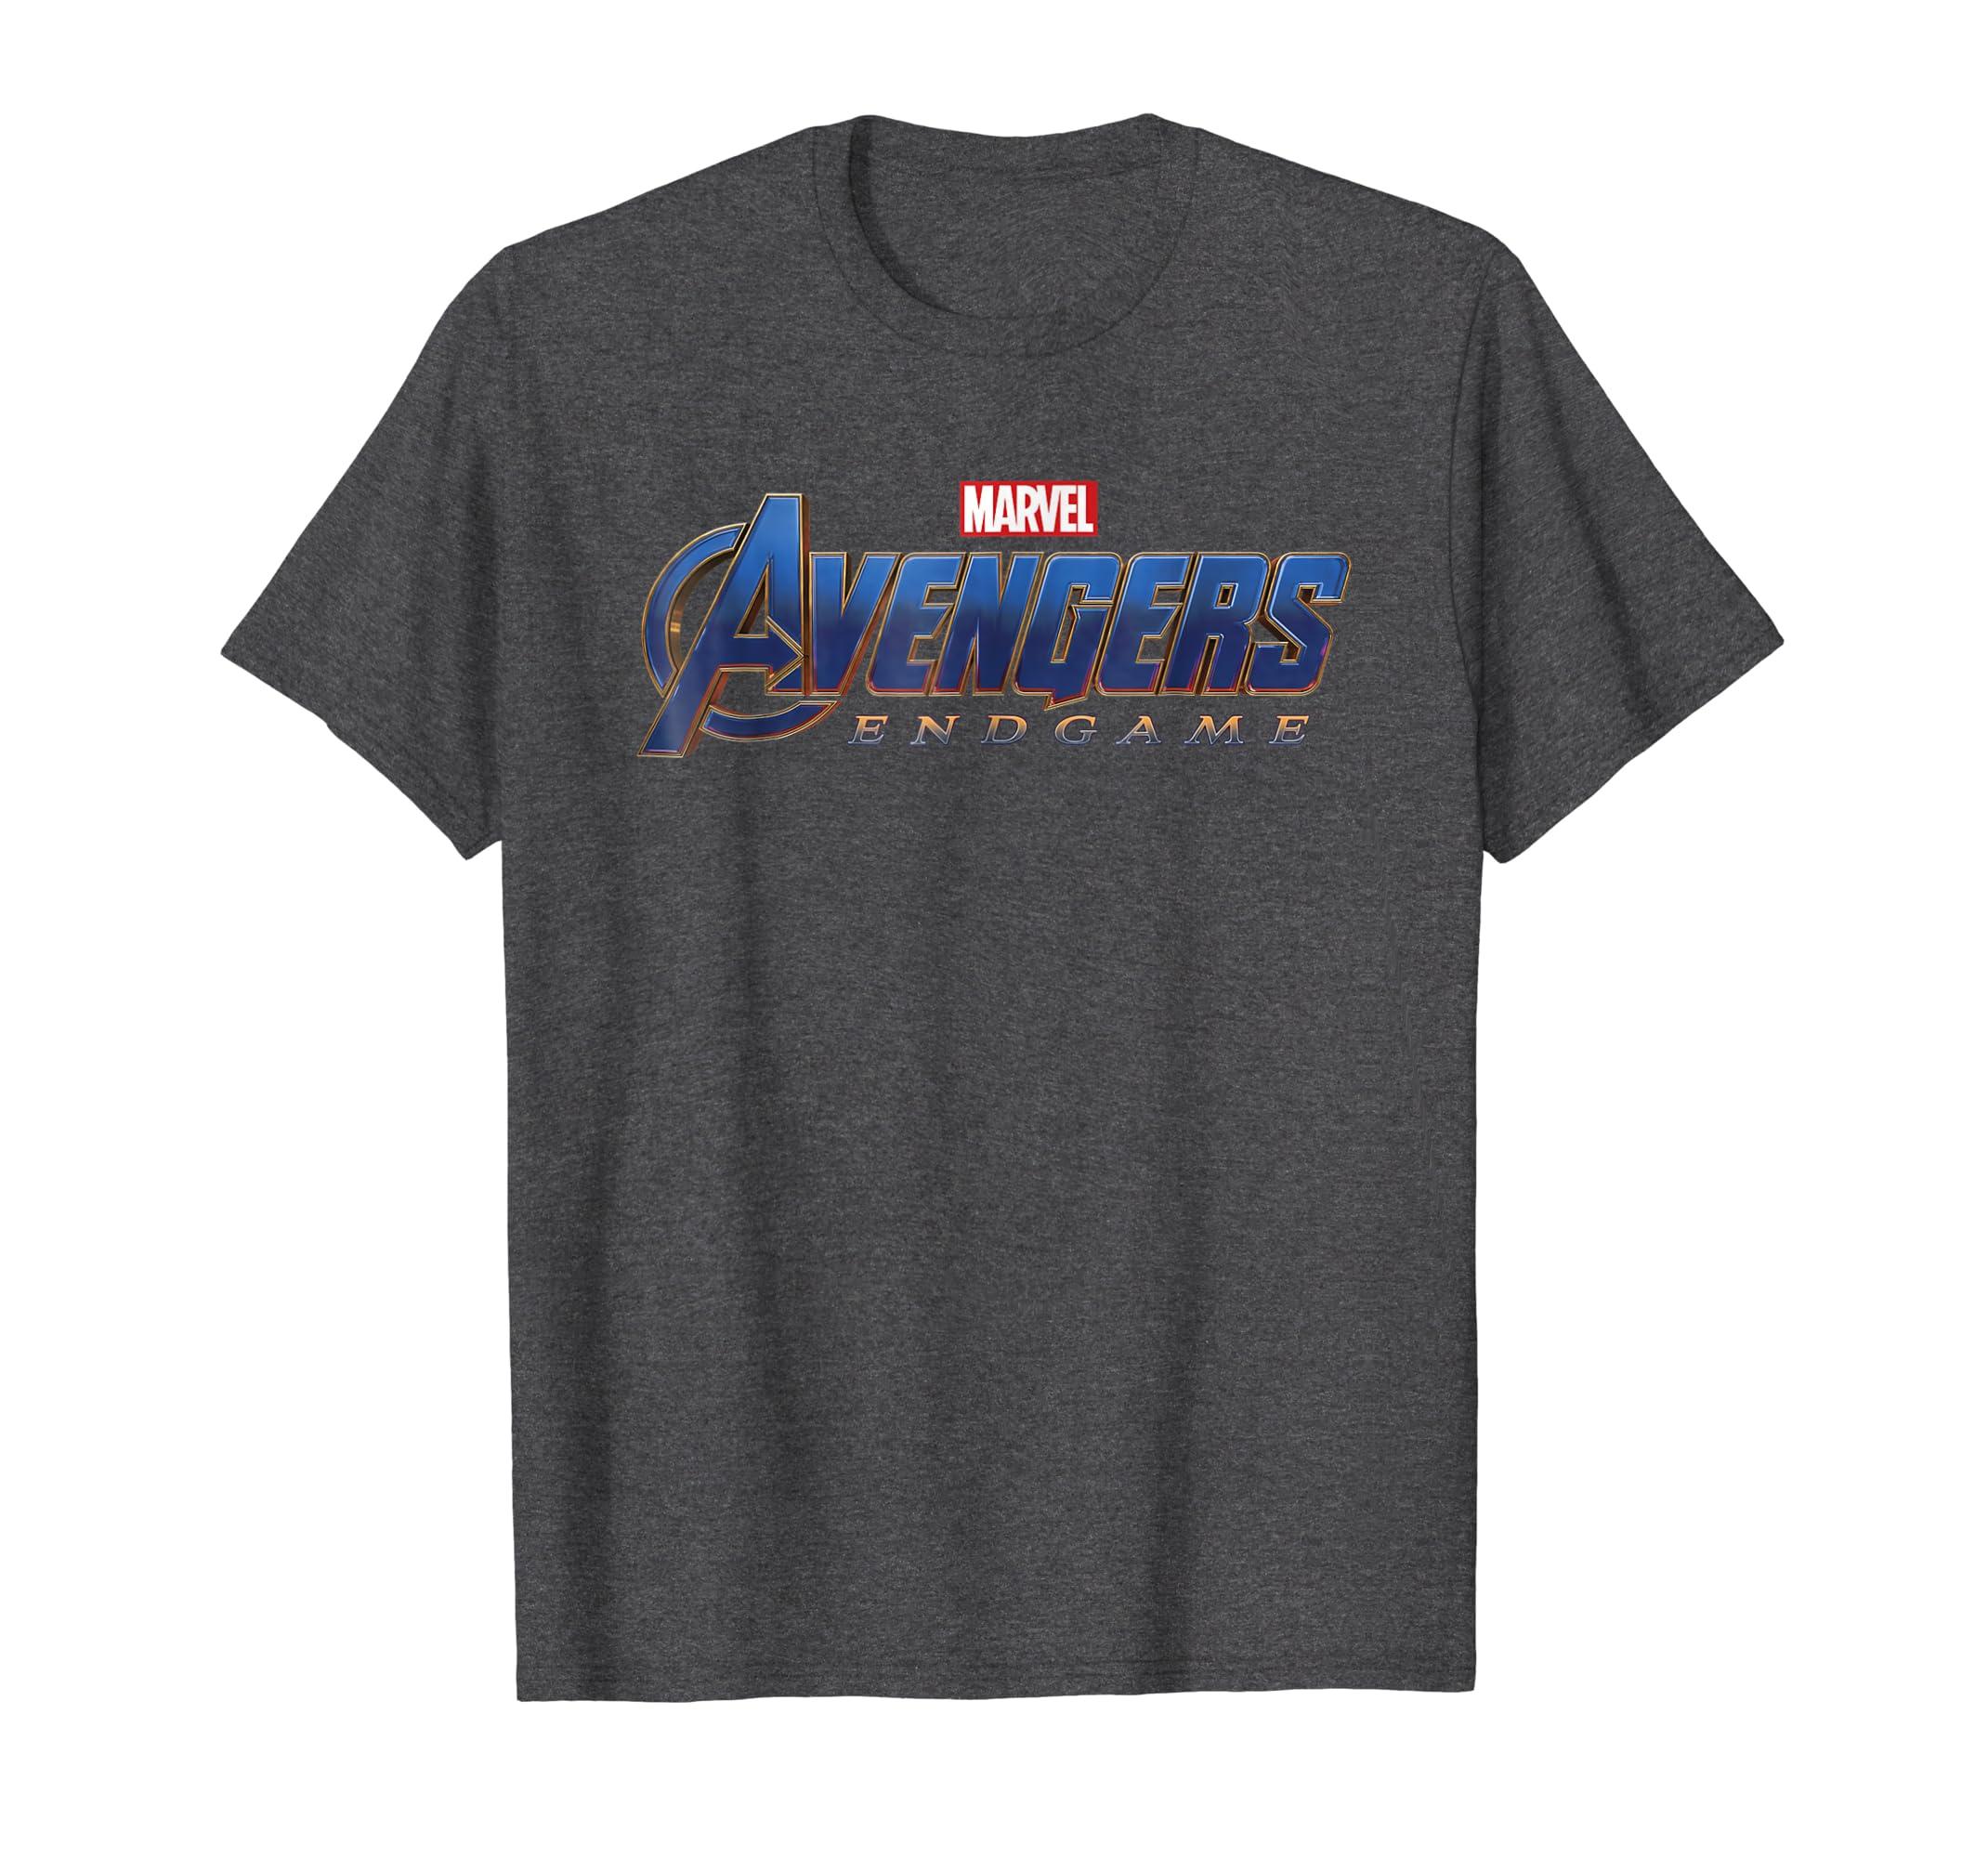 e56a387a56d Amazon.com  Marvel Avengers Endgame Movie Logo Graphic T-Shirt  Clothing